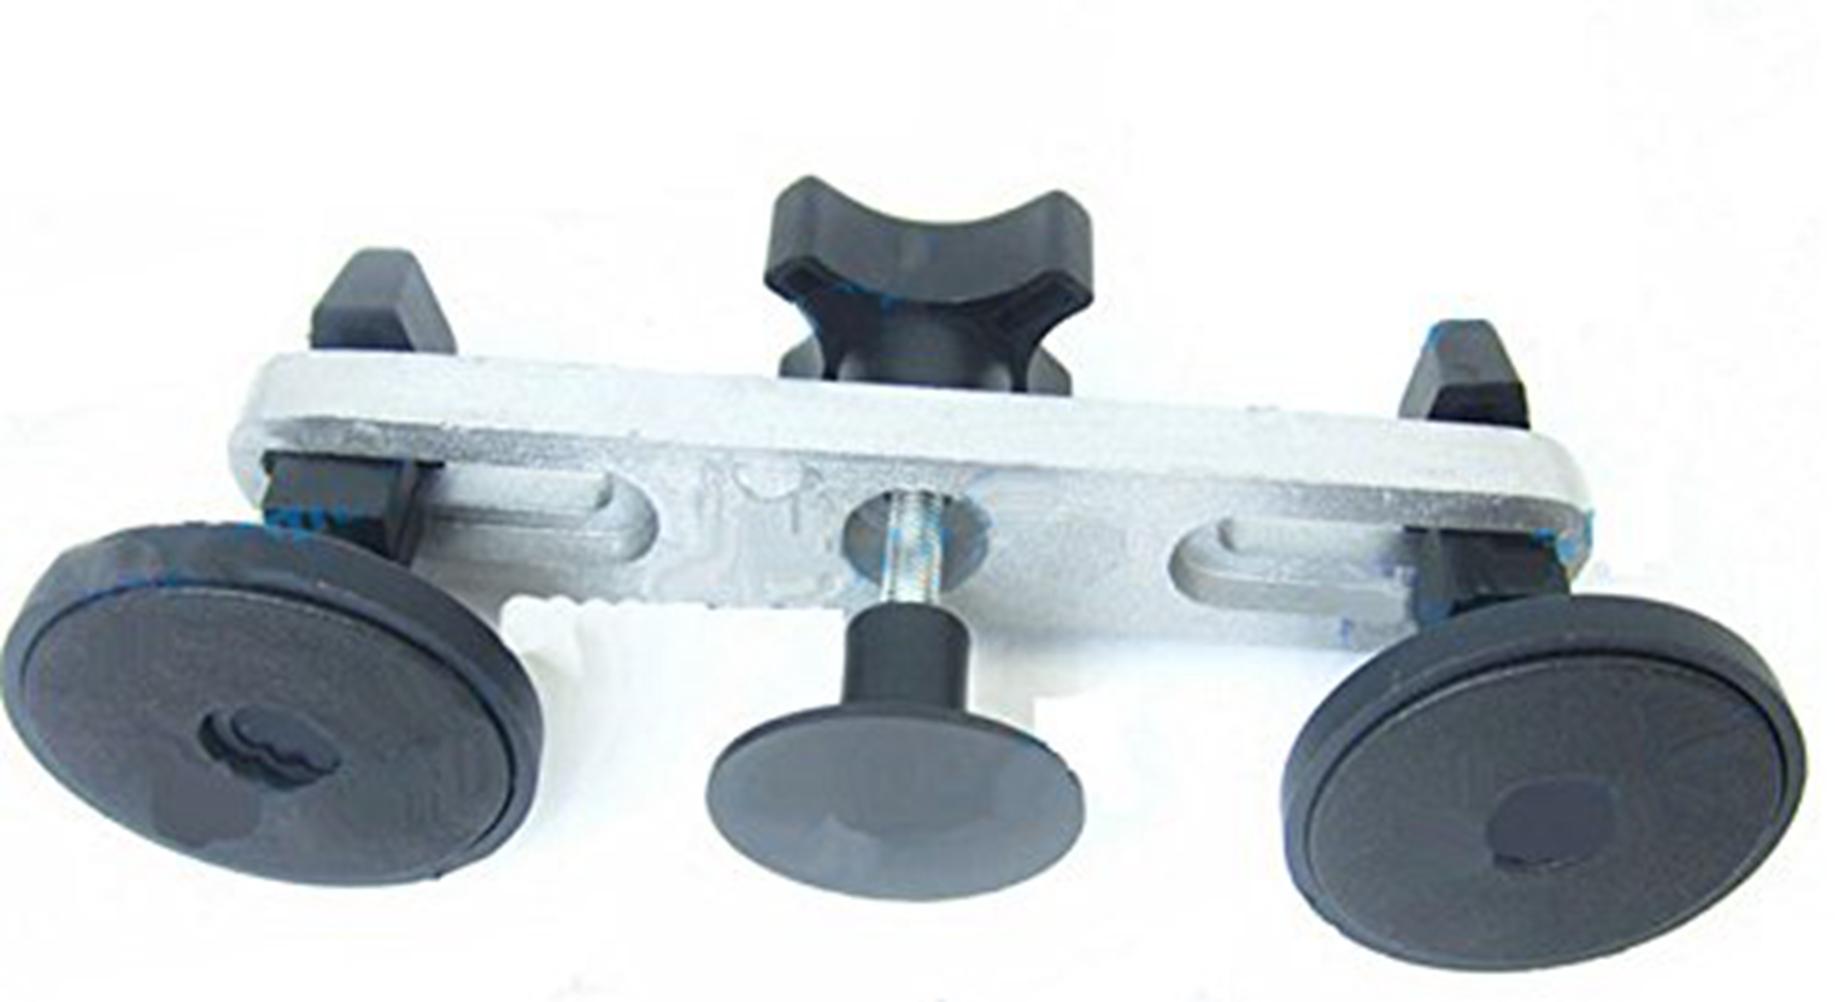 Depression repair tool Non-marking repairer Approach bridge P-1